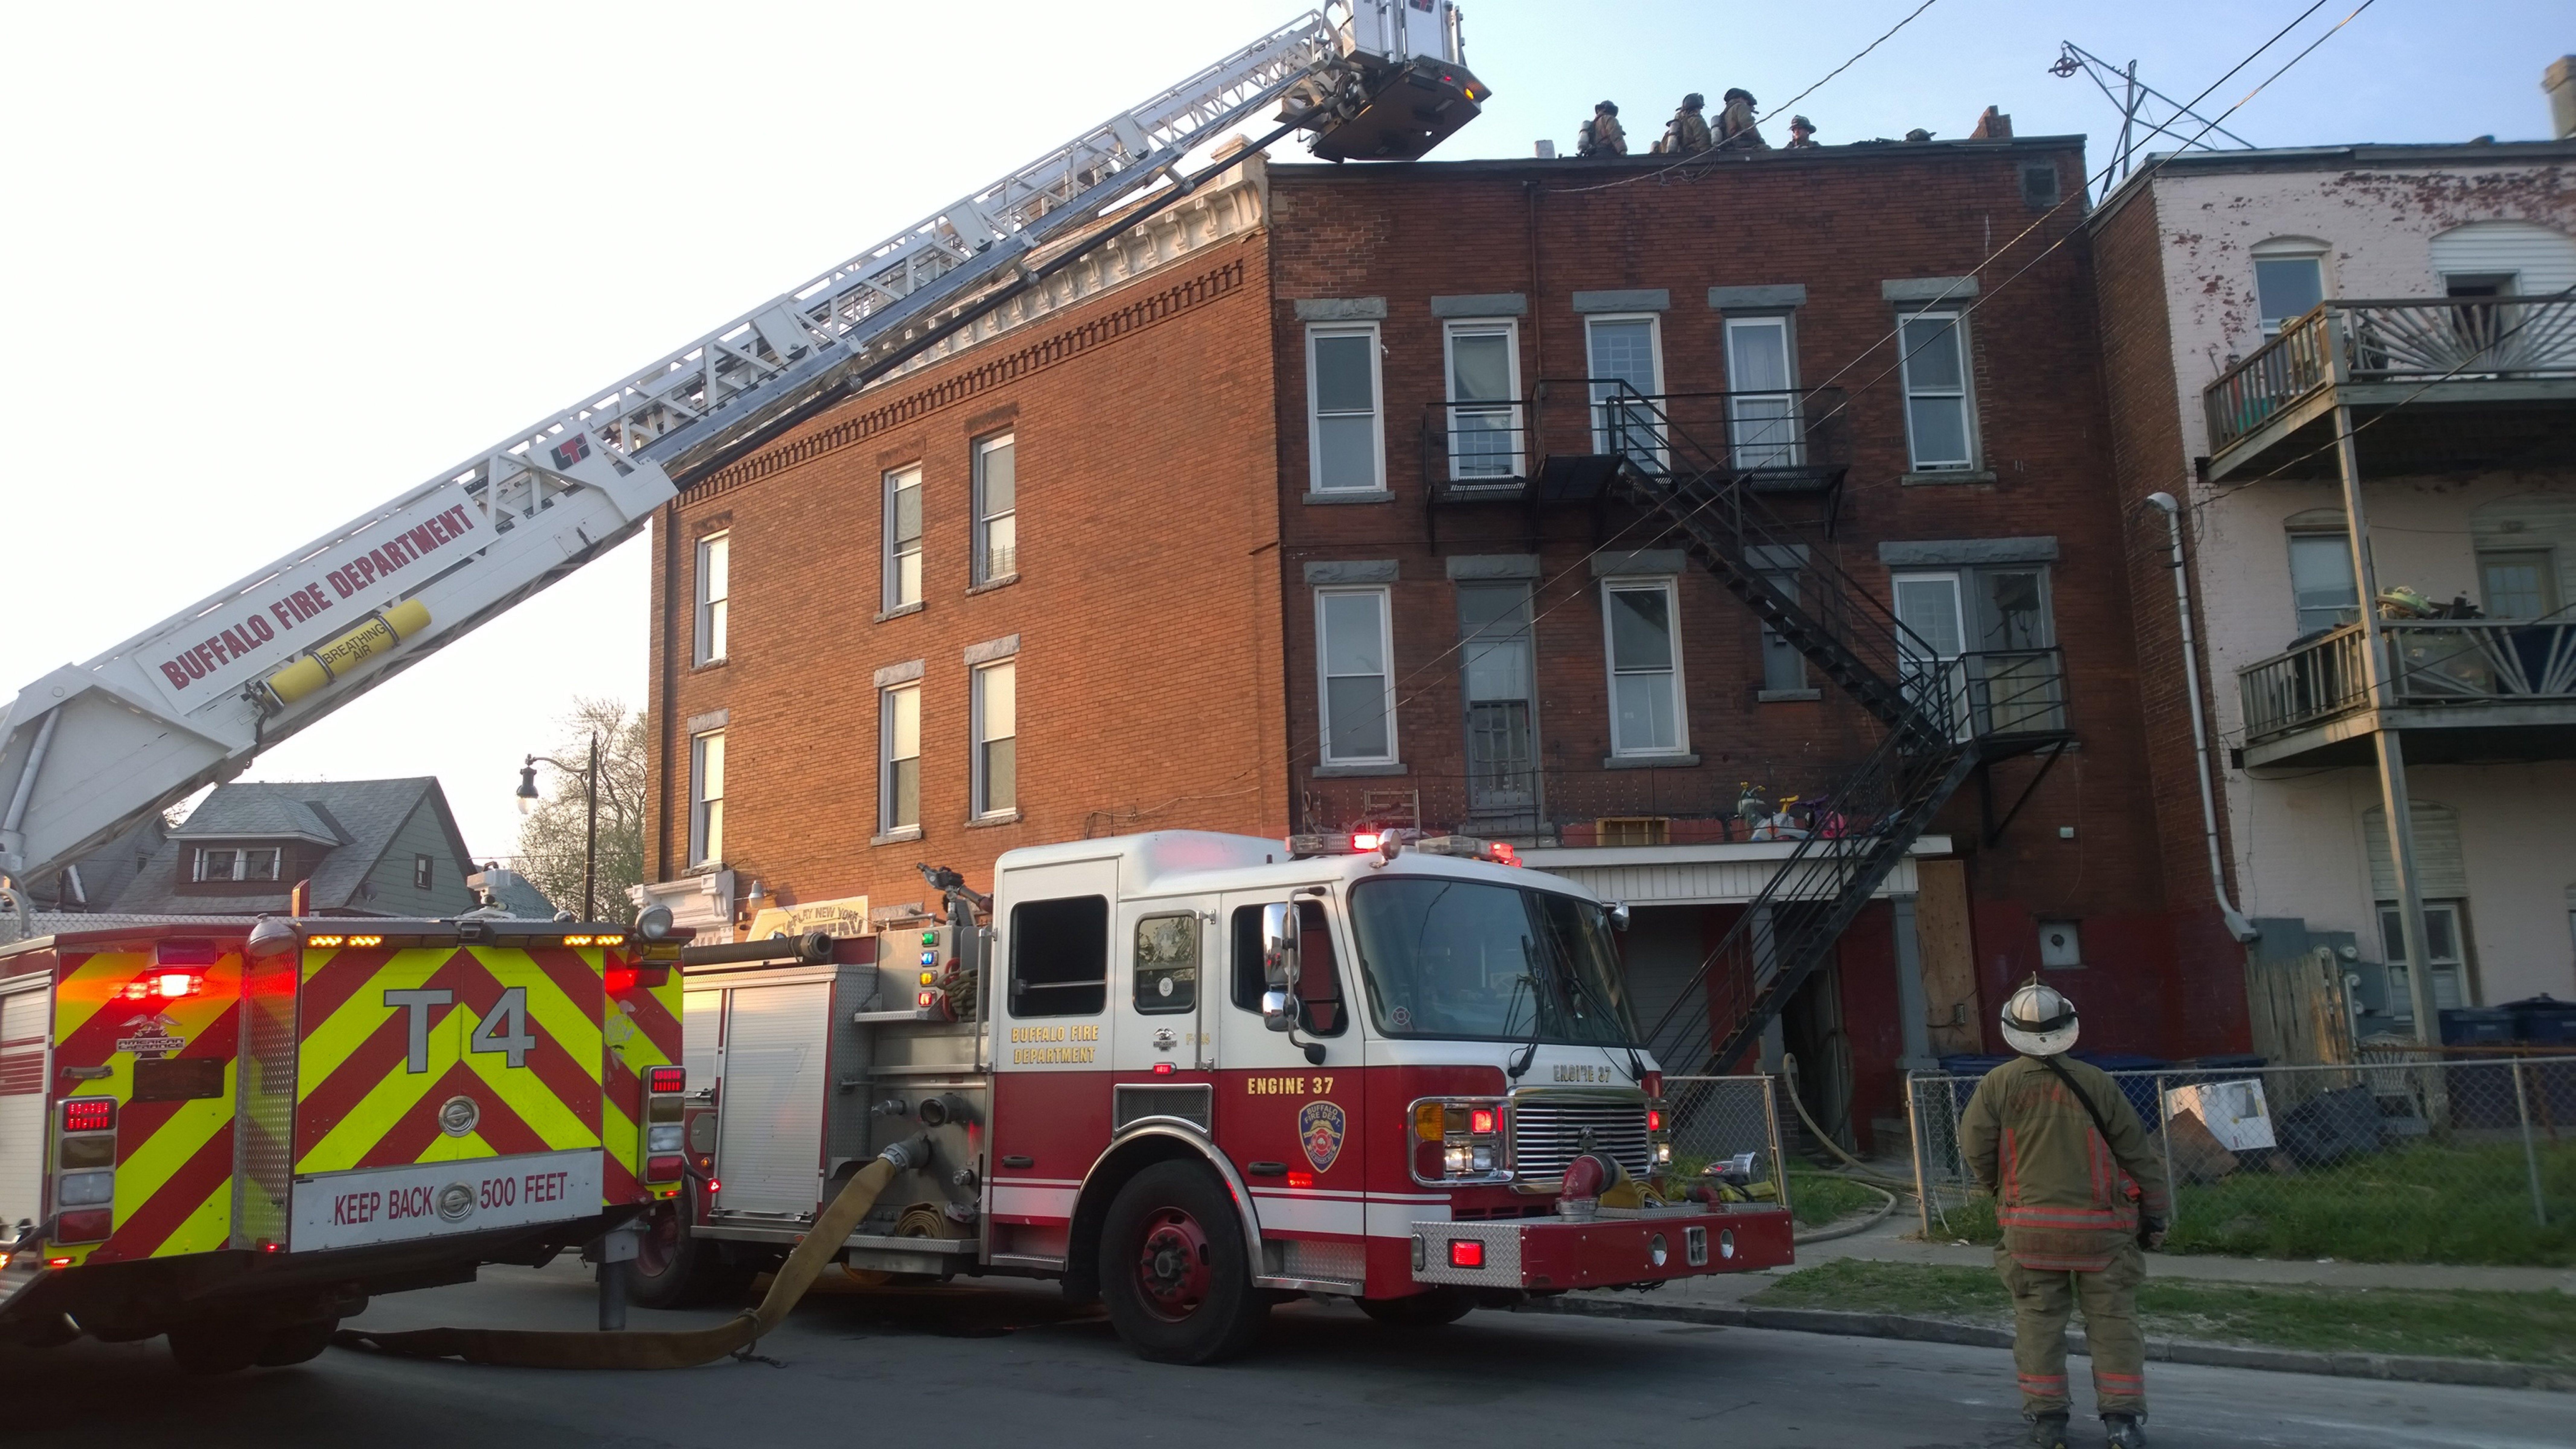 The scene at 318 Hampshire St. on Saturday morning. (David F.Kazmierczak)